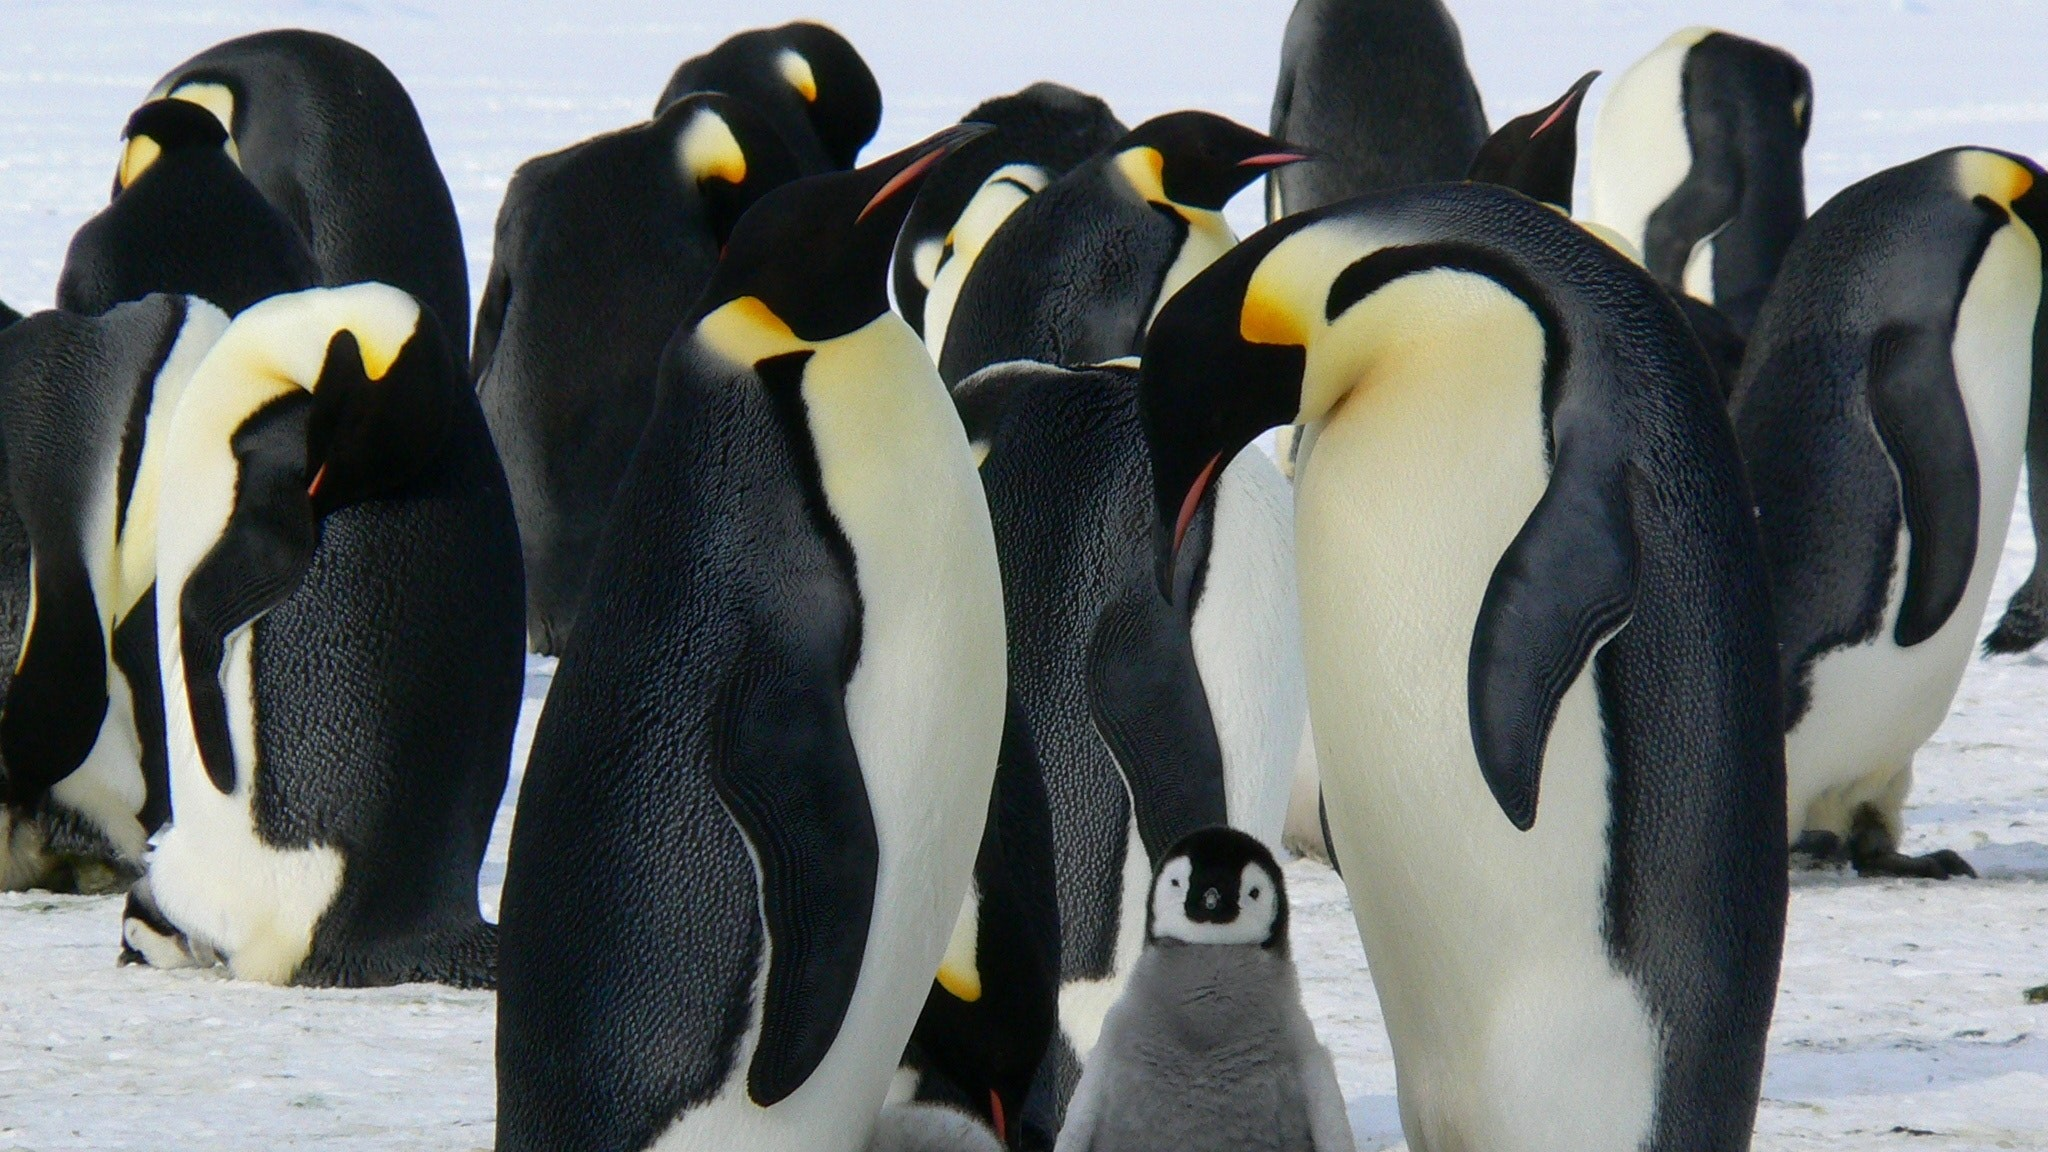 Emperor penguins gathered in a huddle